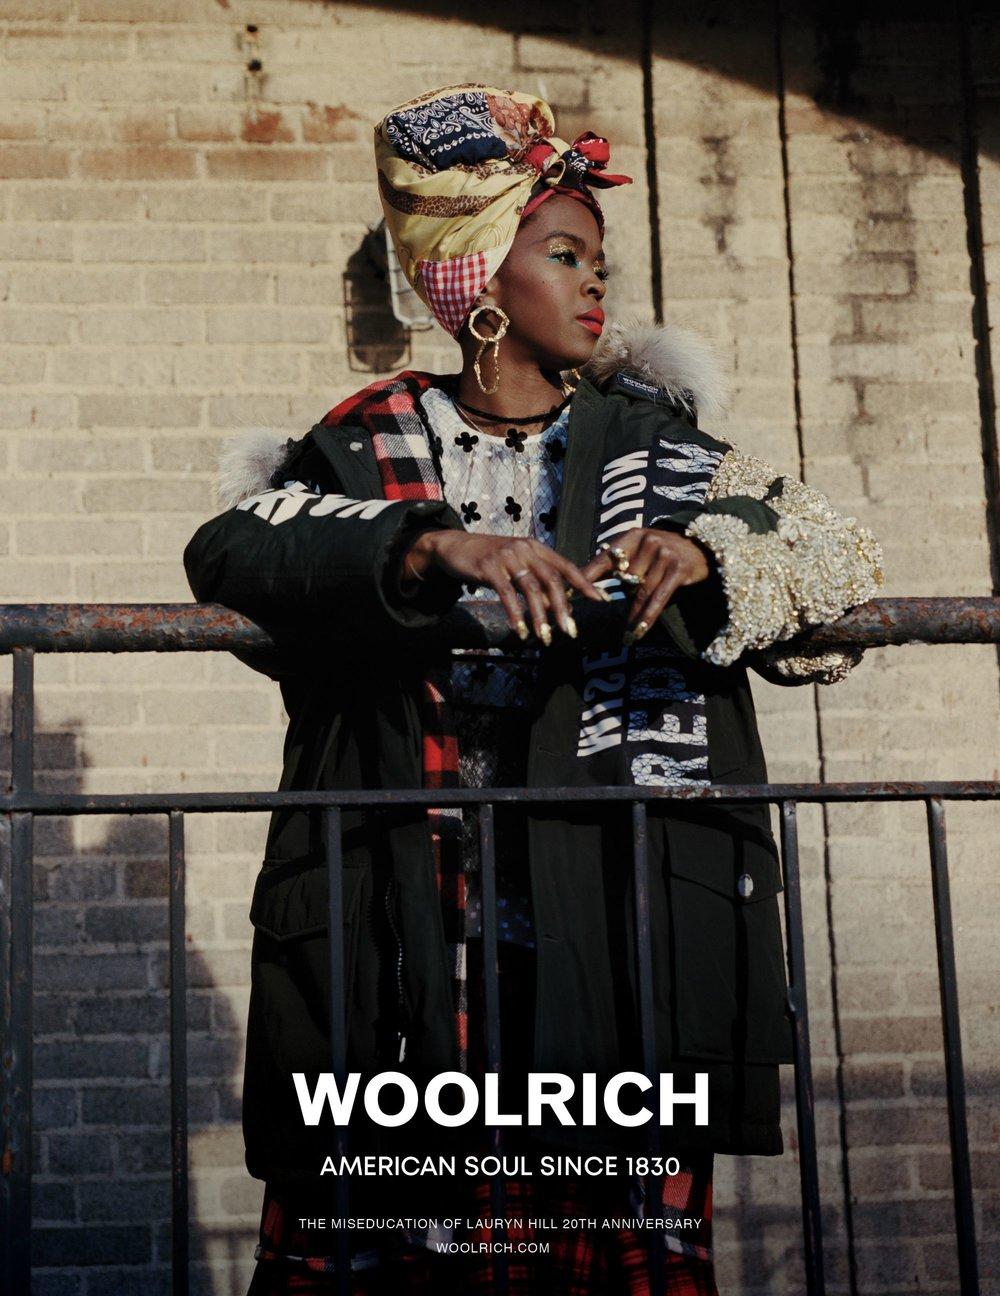 Woolrich-FW-18-ADV-Campaign-7.jpg